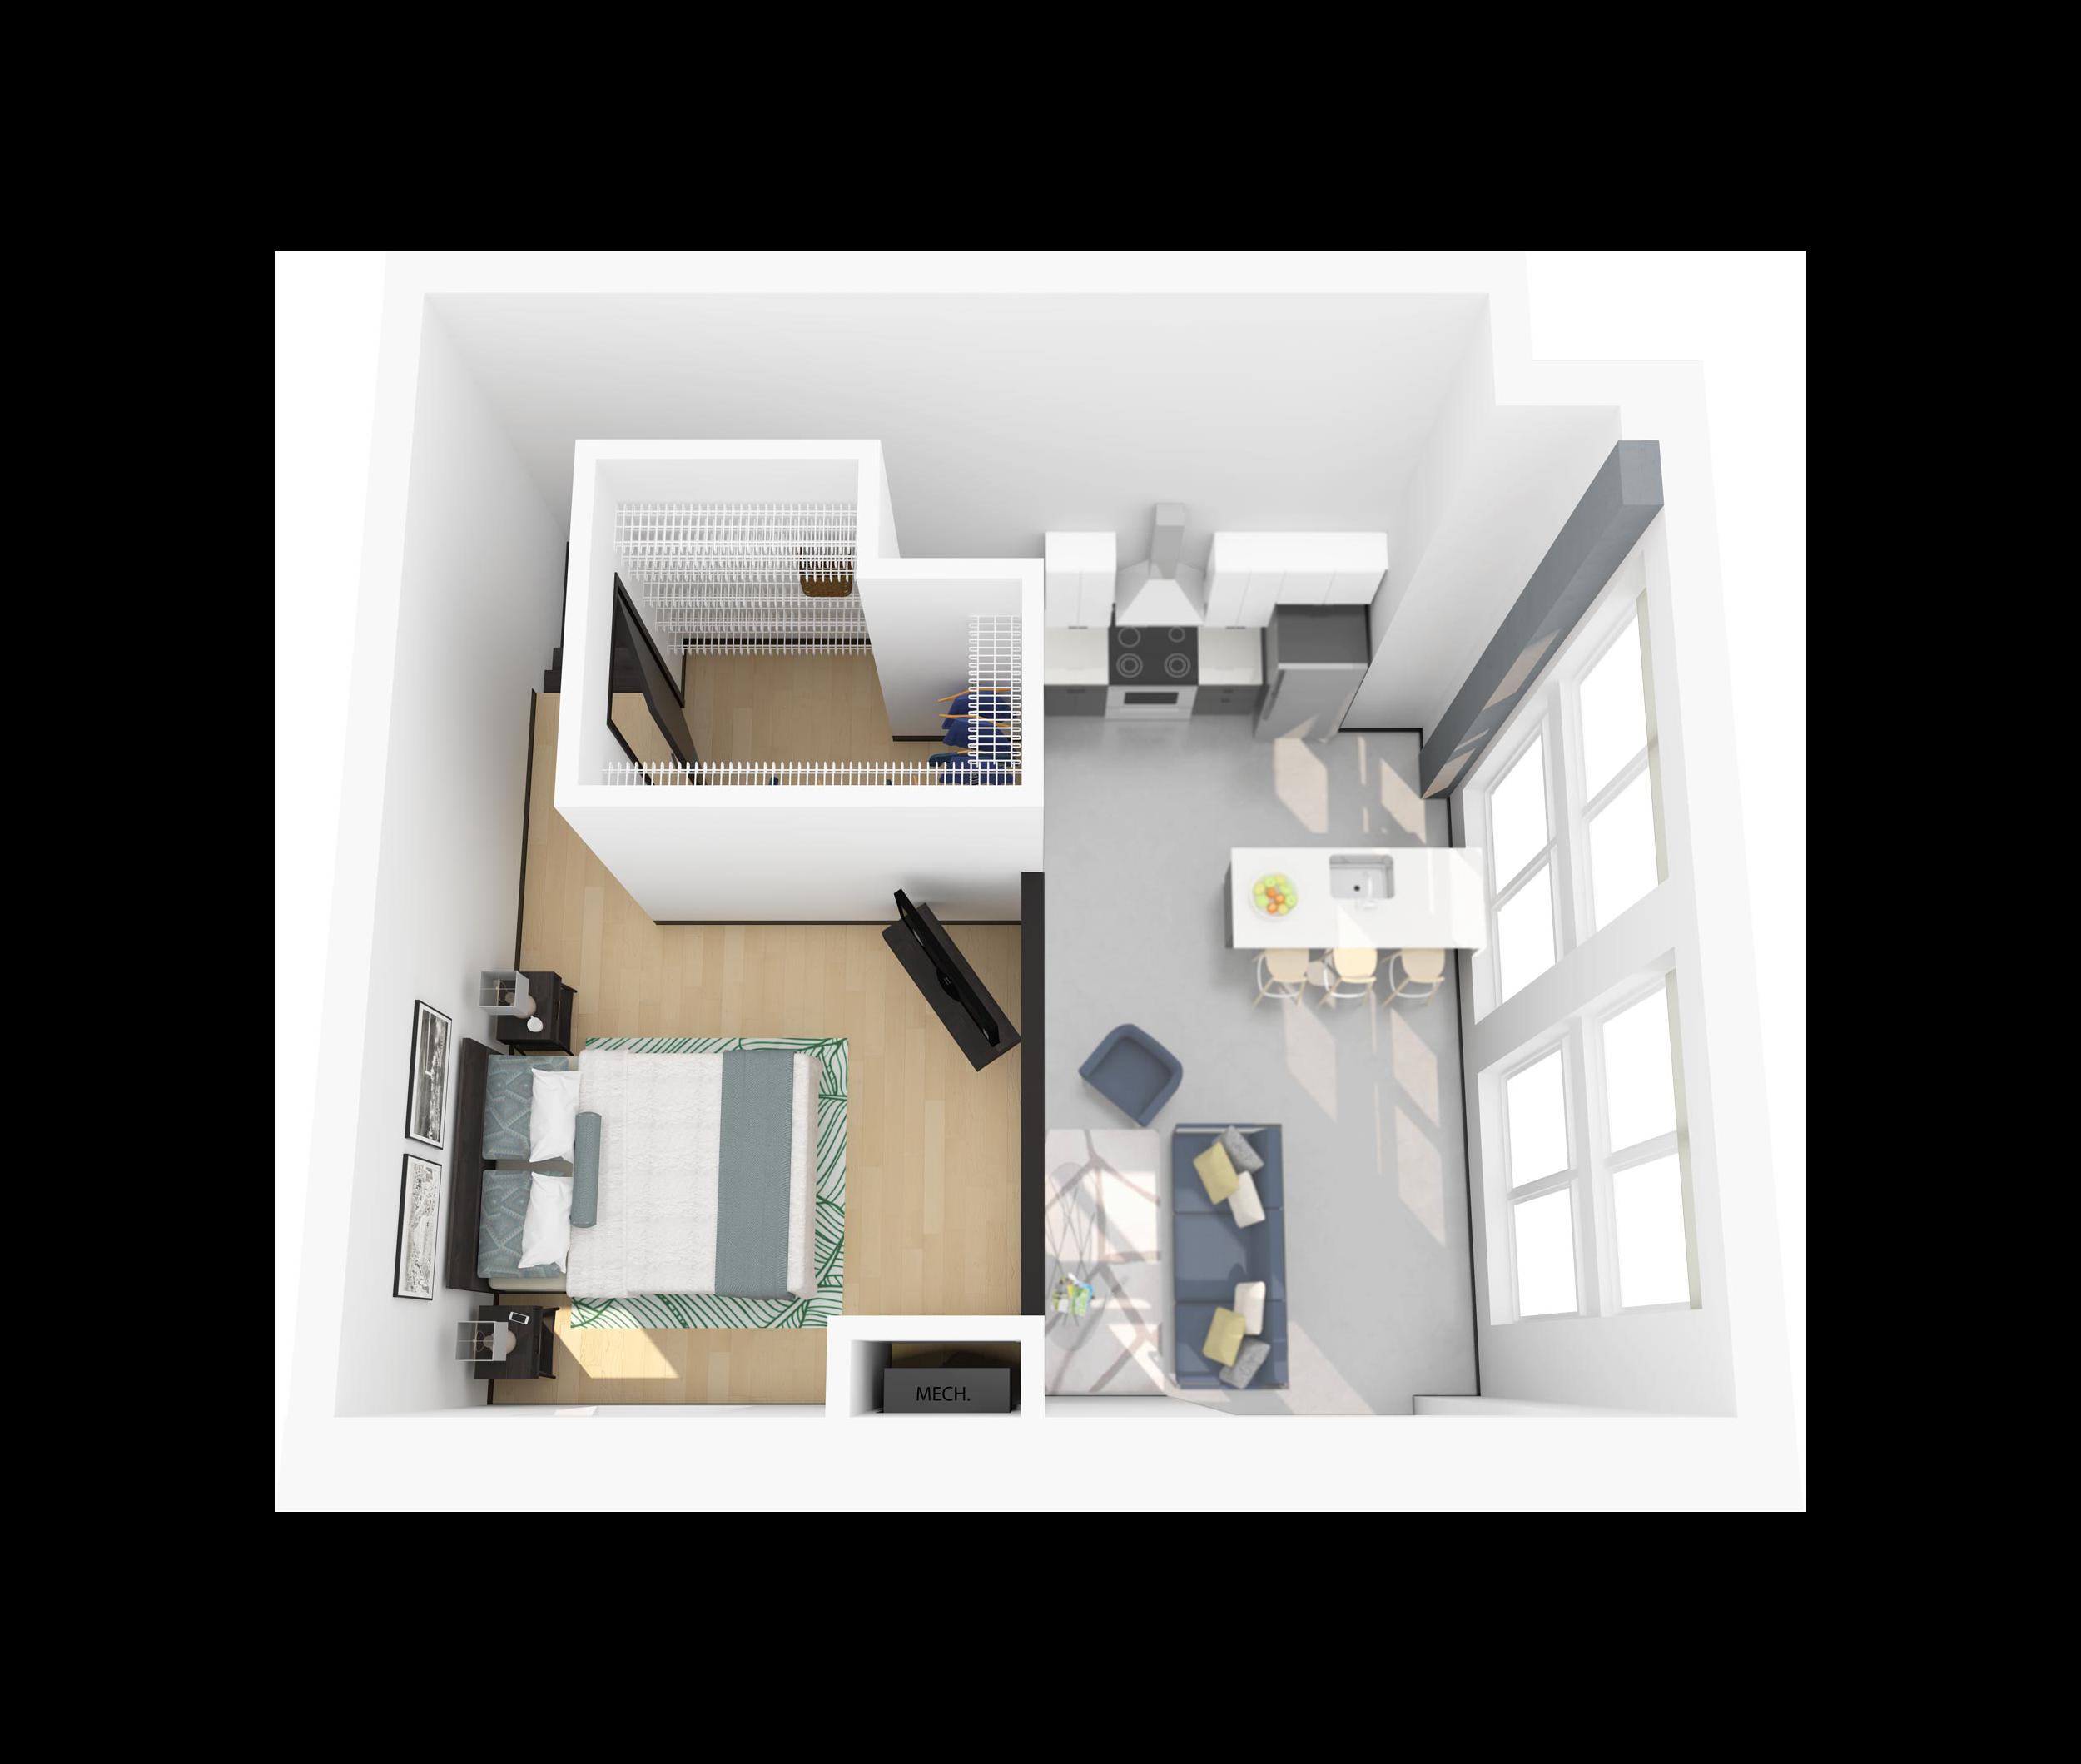 Floor Plan O – Apartment with Loft Bedroom